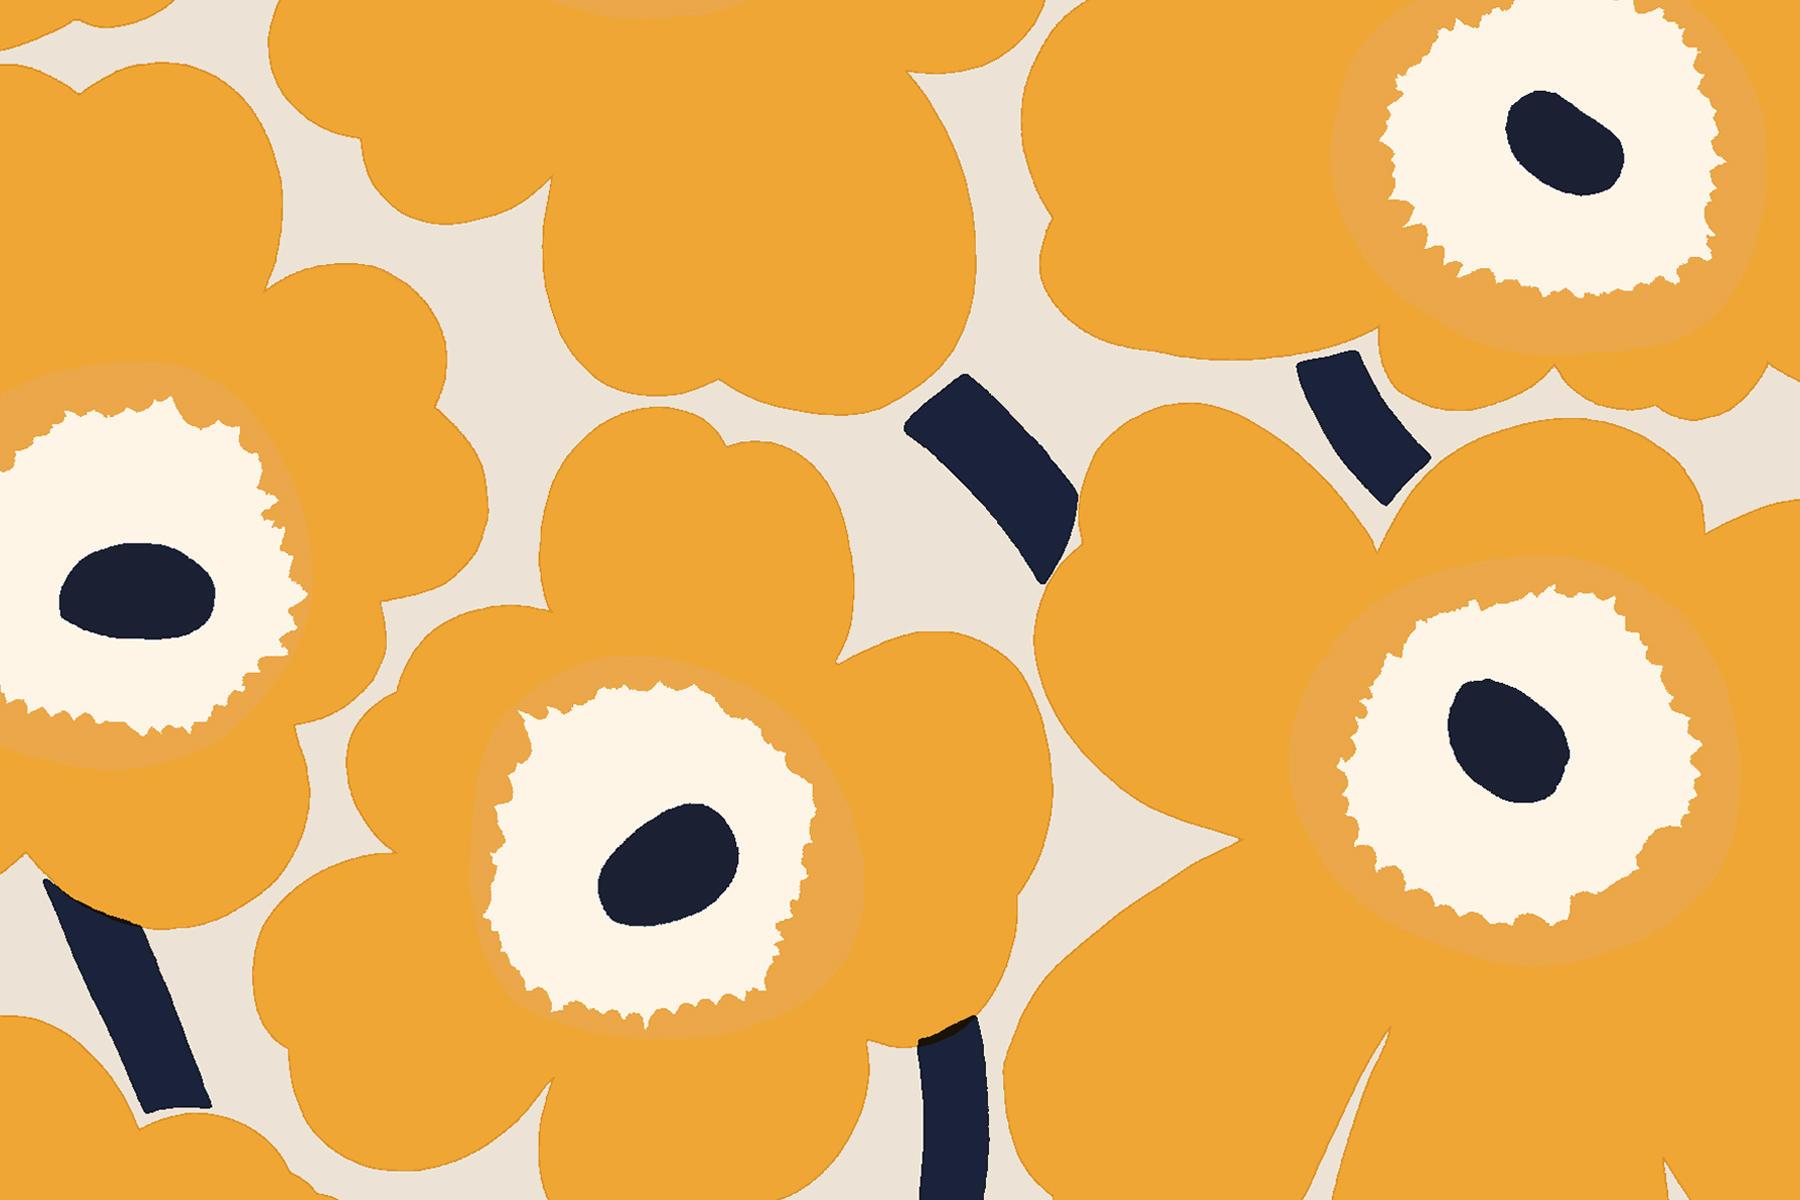 6.1-30 Marimekko mobile wallpapers